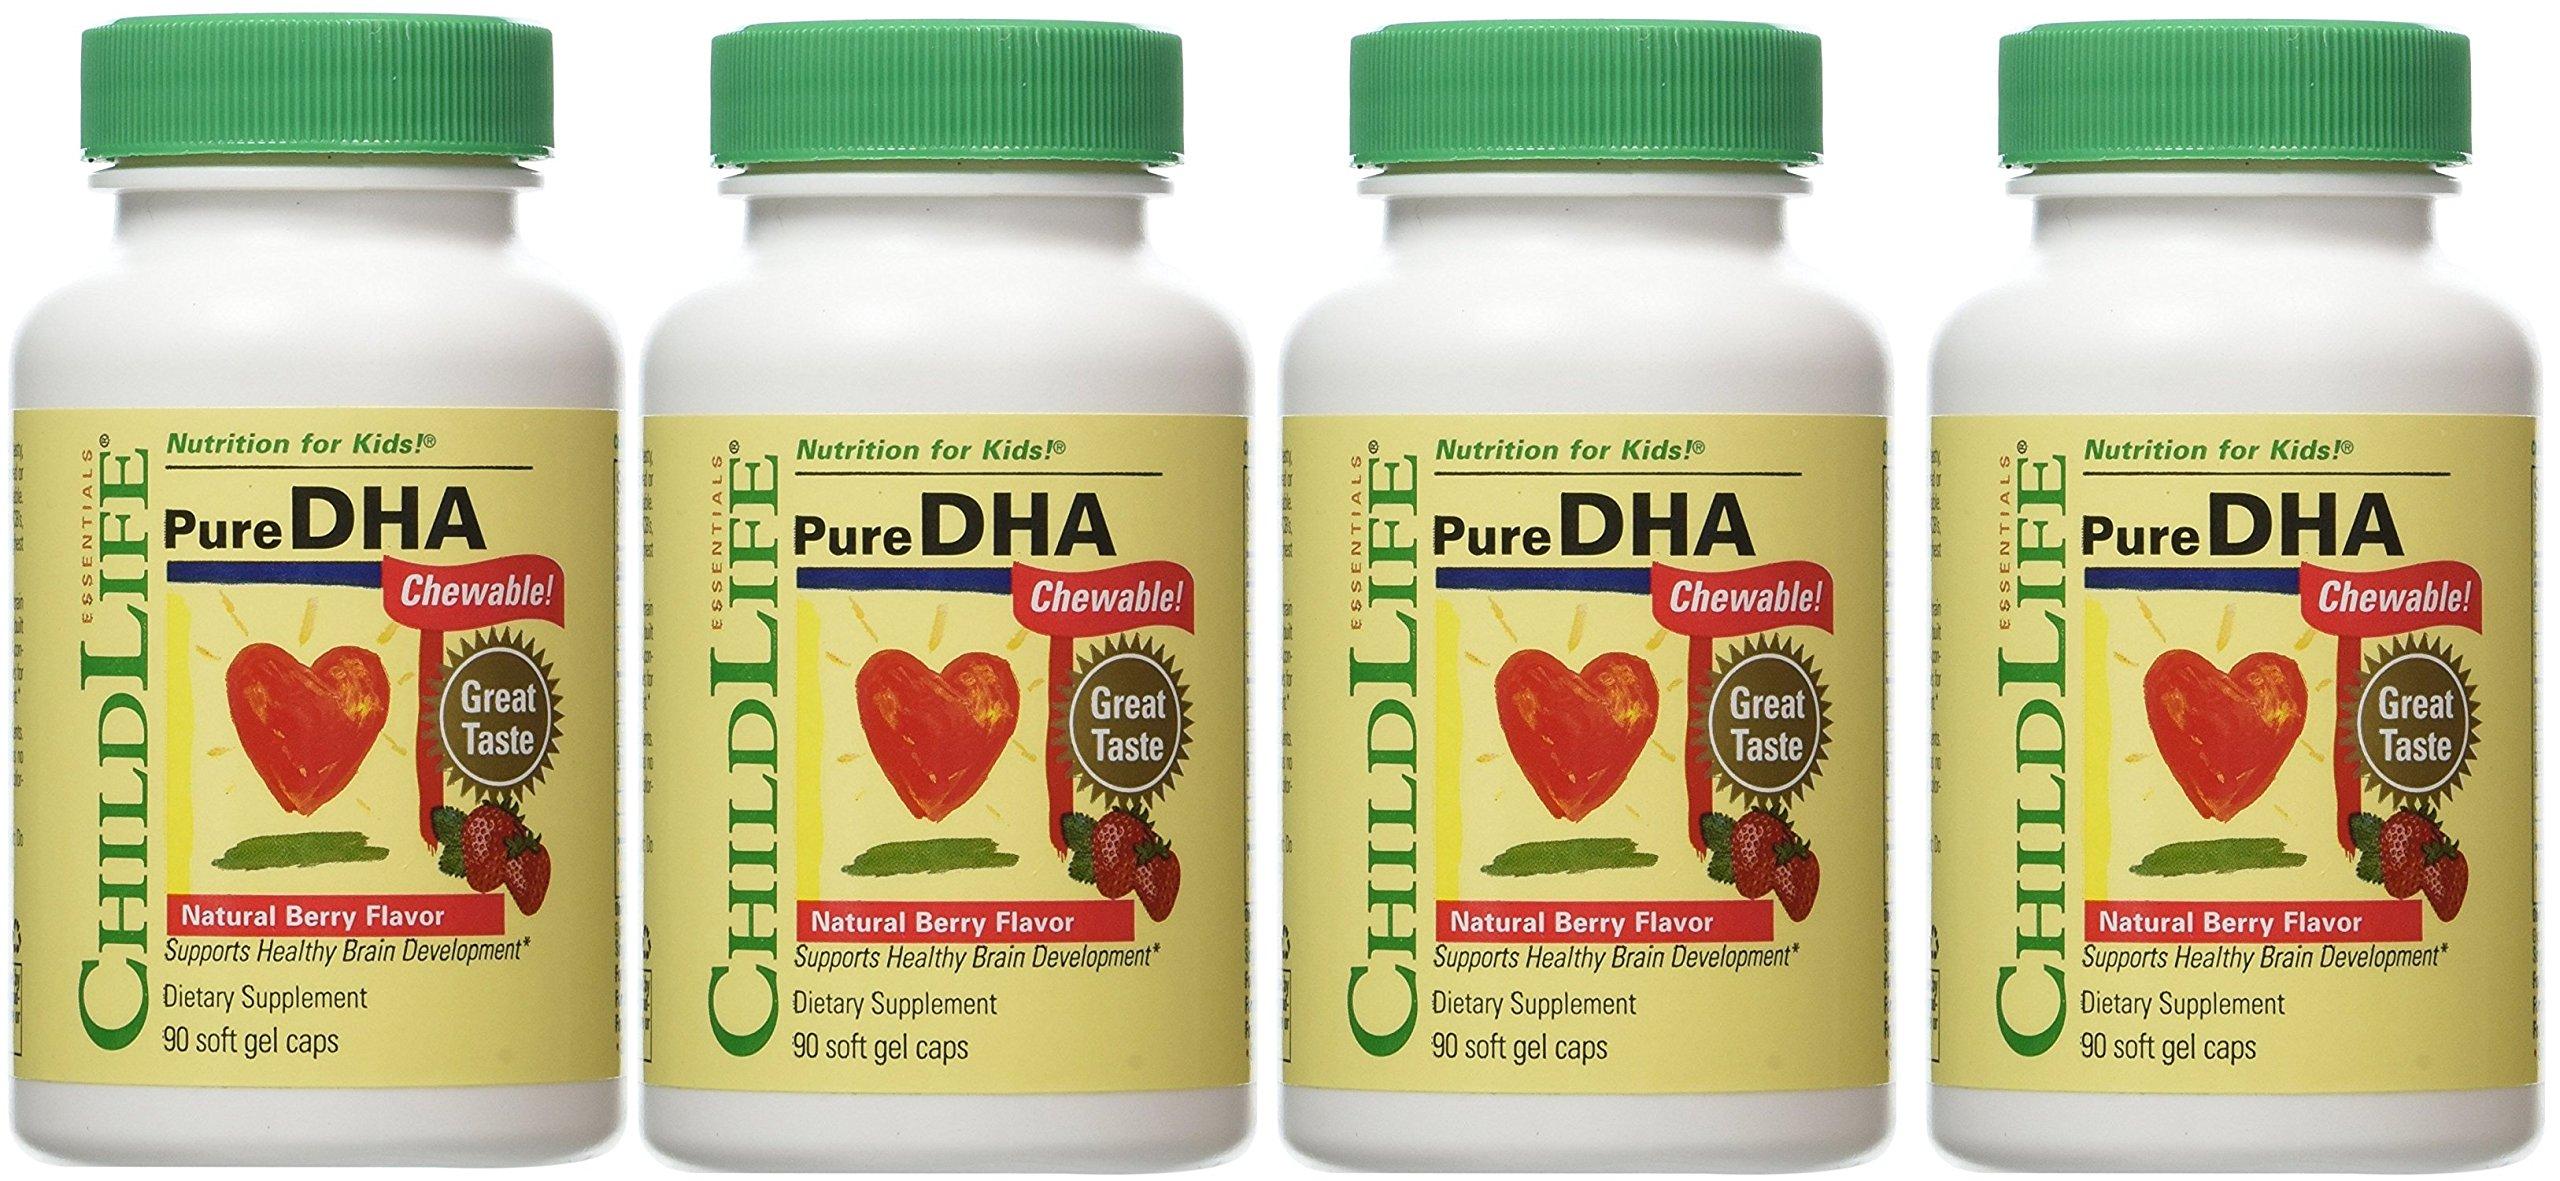 ChildLife, Pure DHA Chewable, Natural Berry Flavor, 4Pack (90 Soft Gel Caps Each) Dvvle